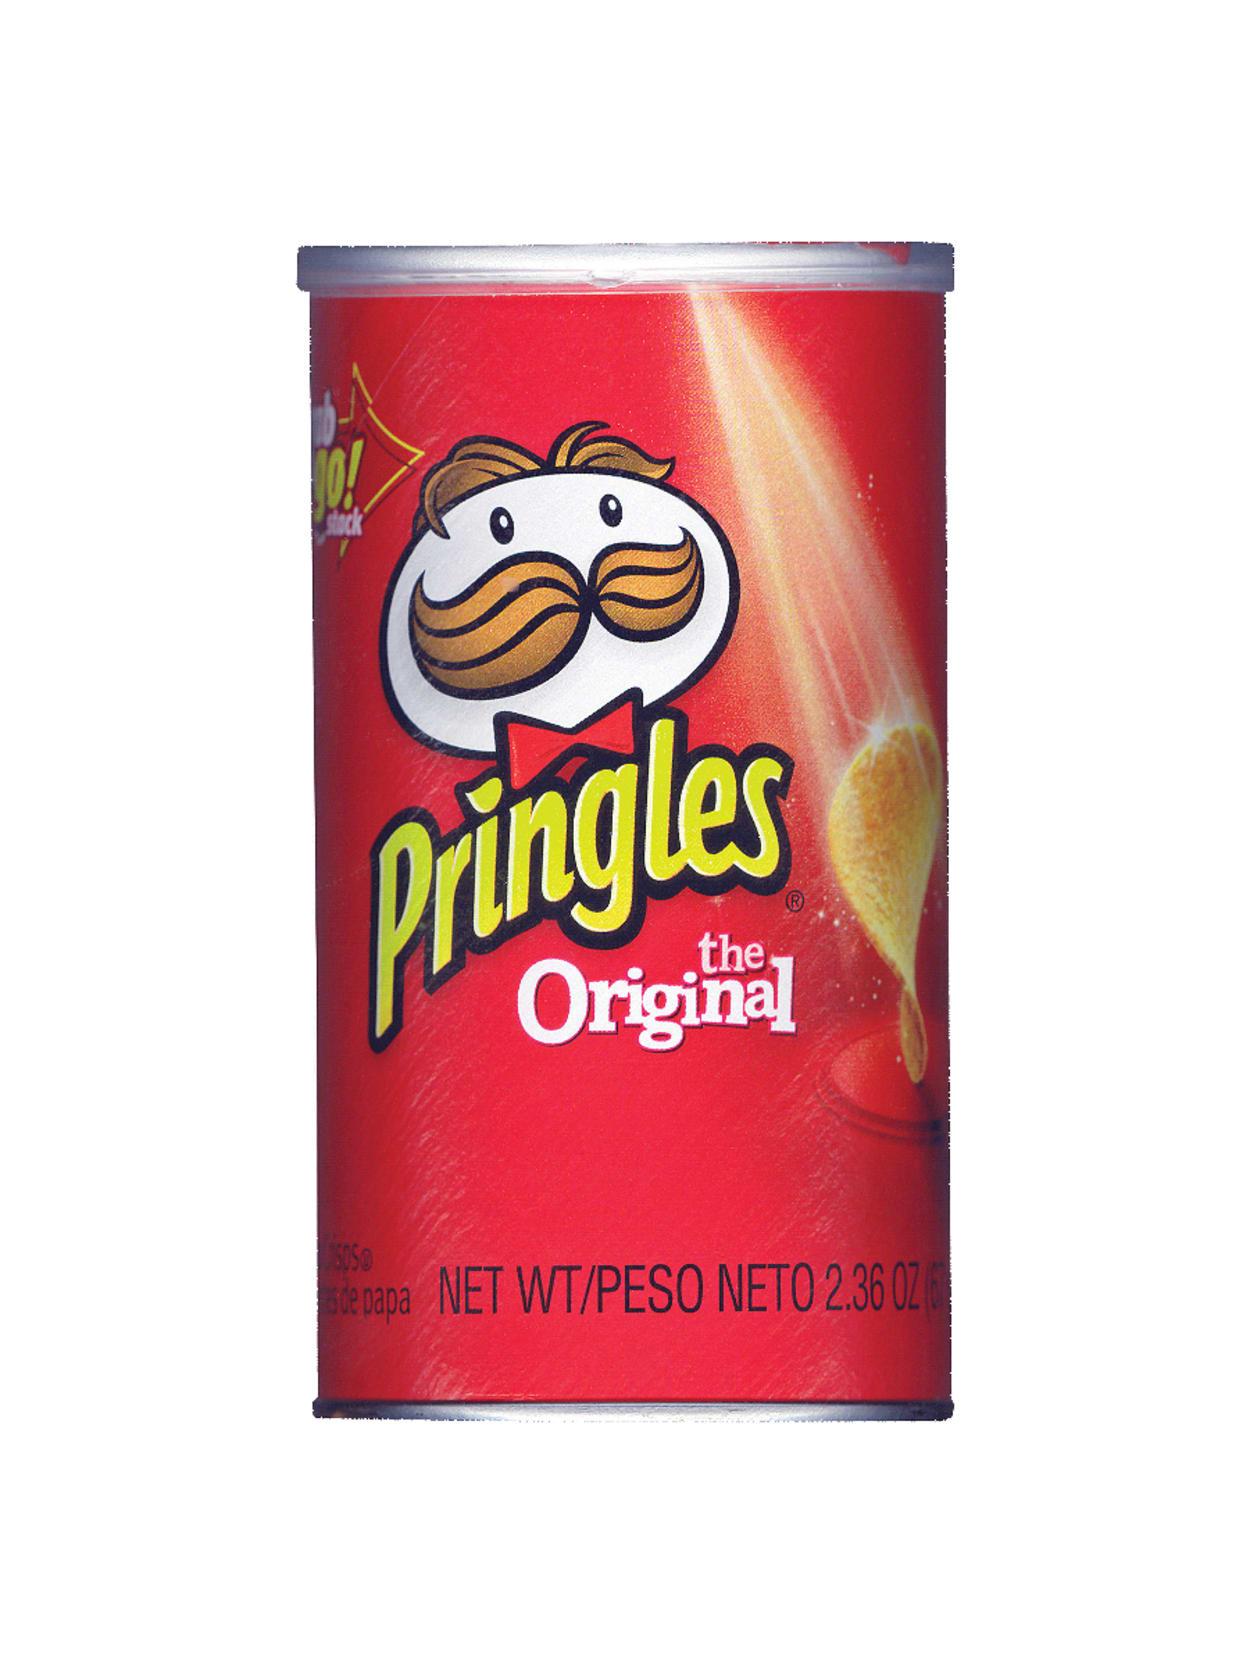 Pringles Original Potato Chips 2.38 Oz